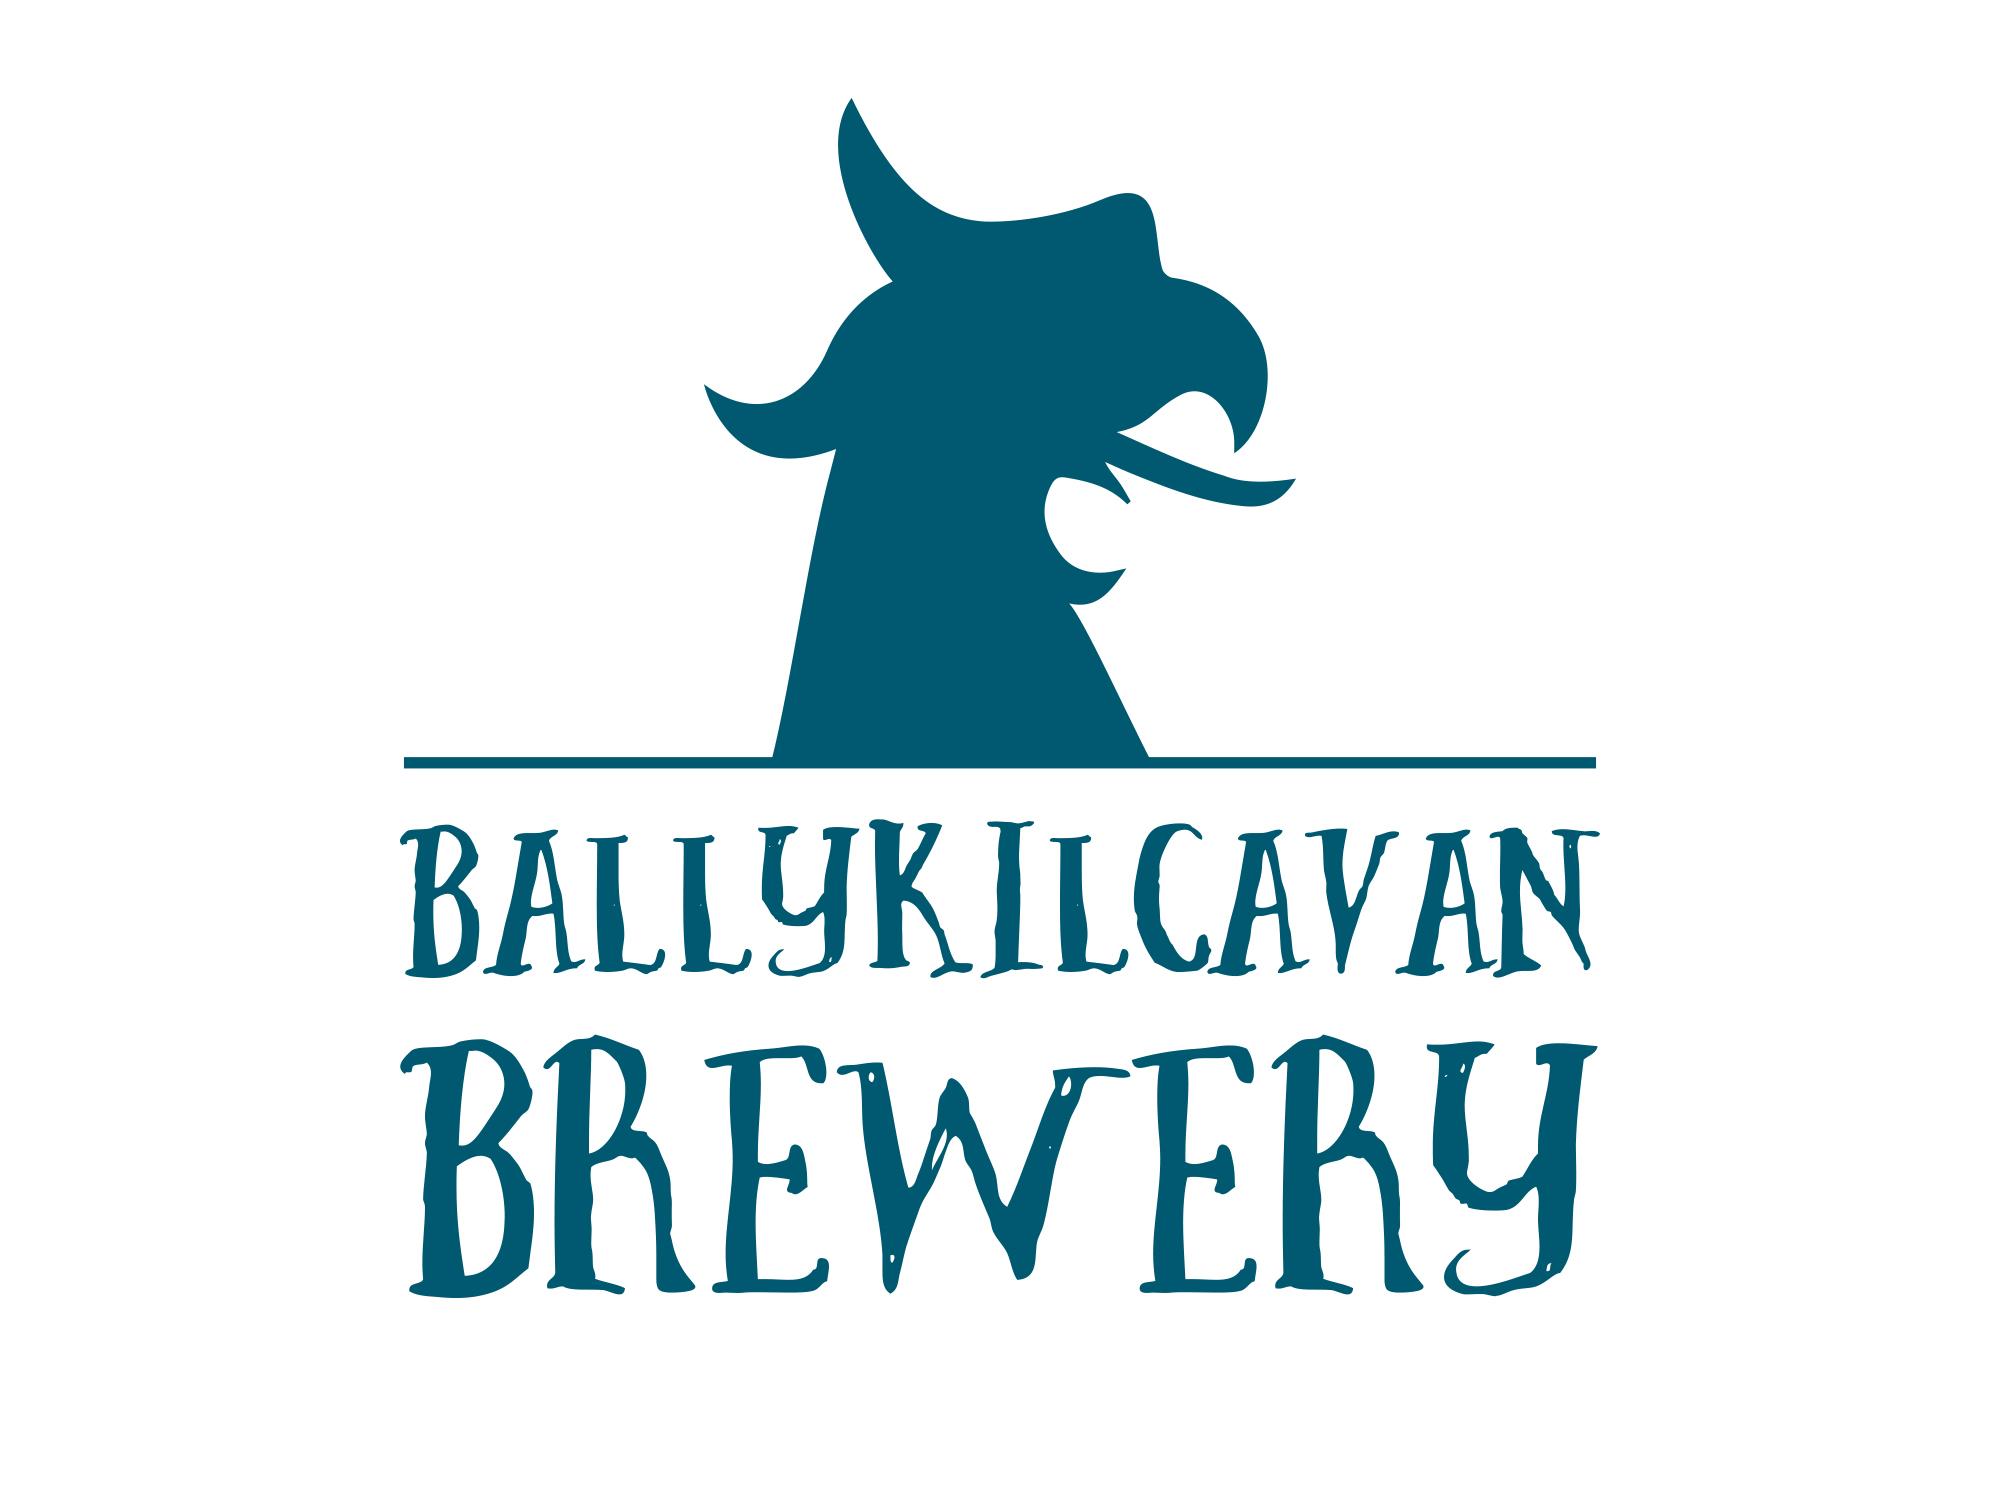 Cover image: Ballykilcavan Brewery